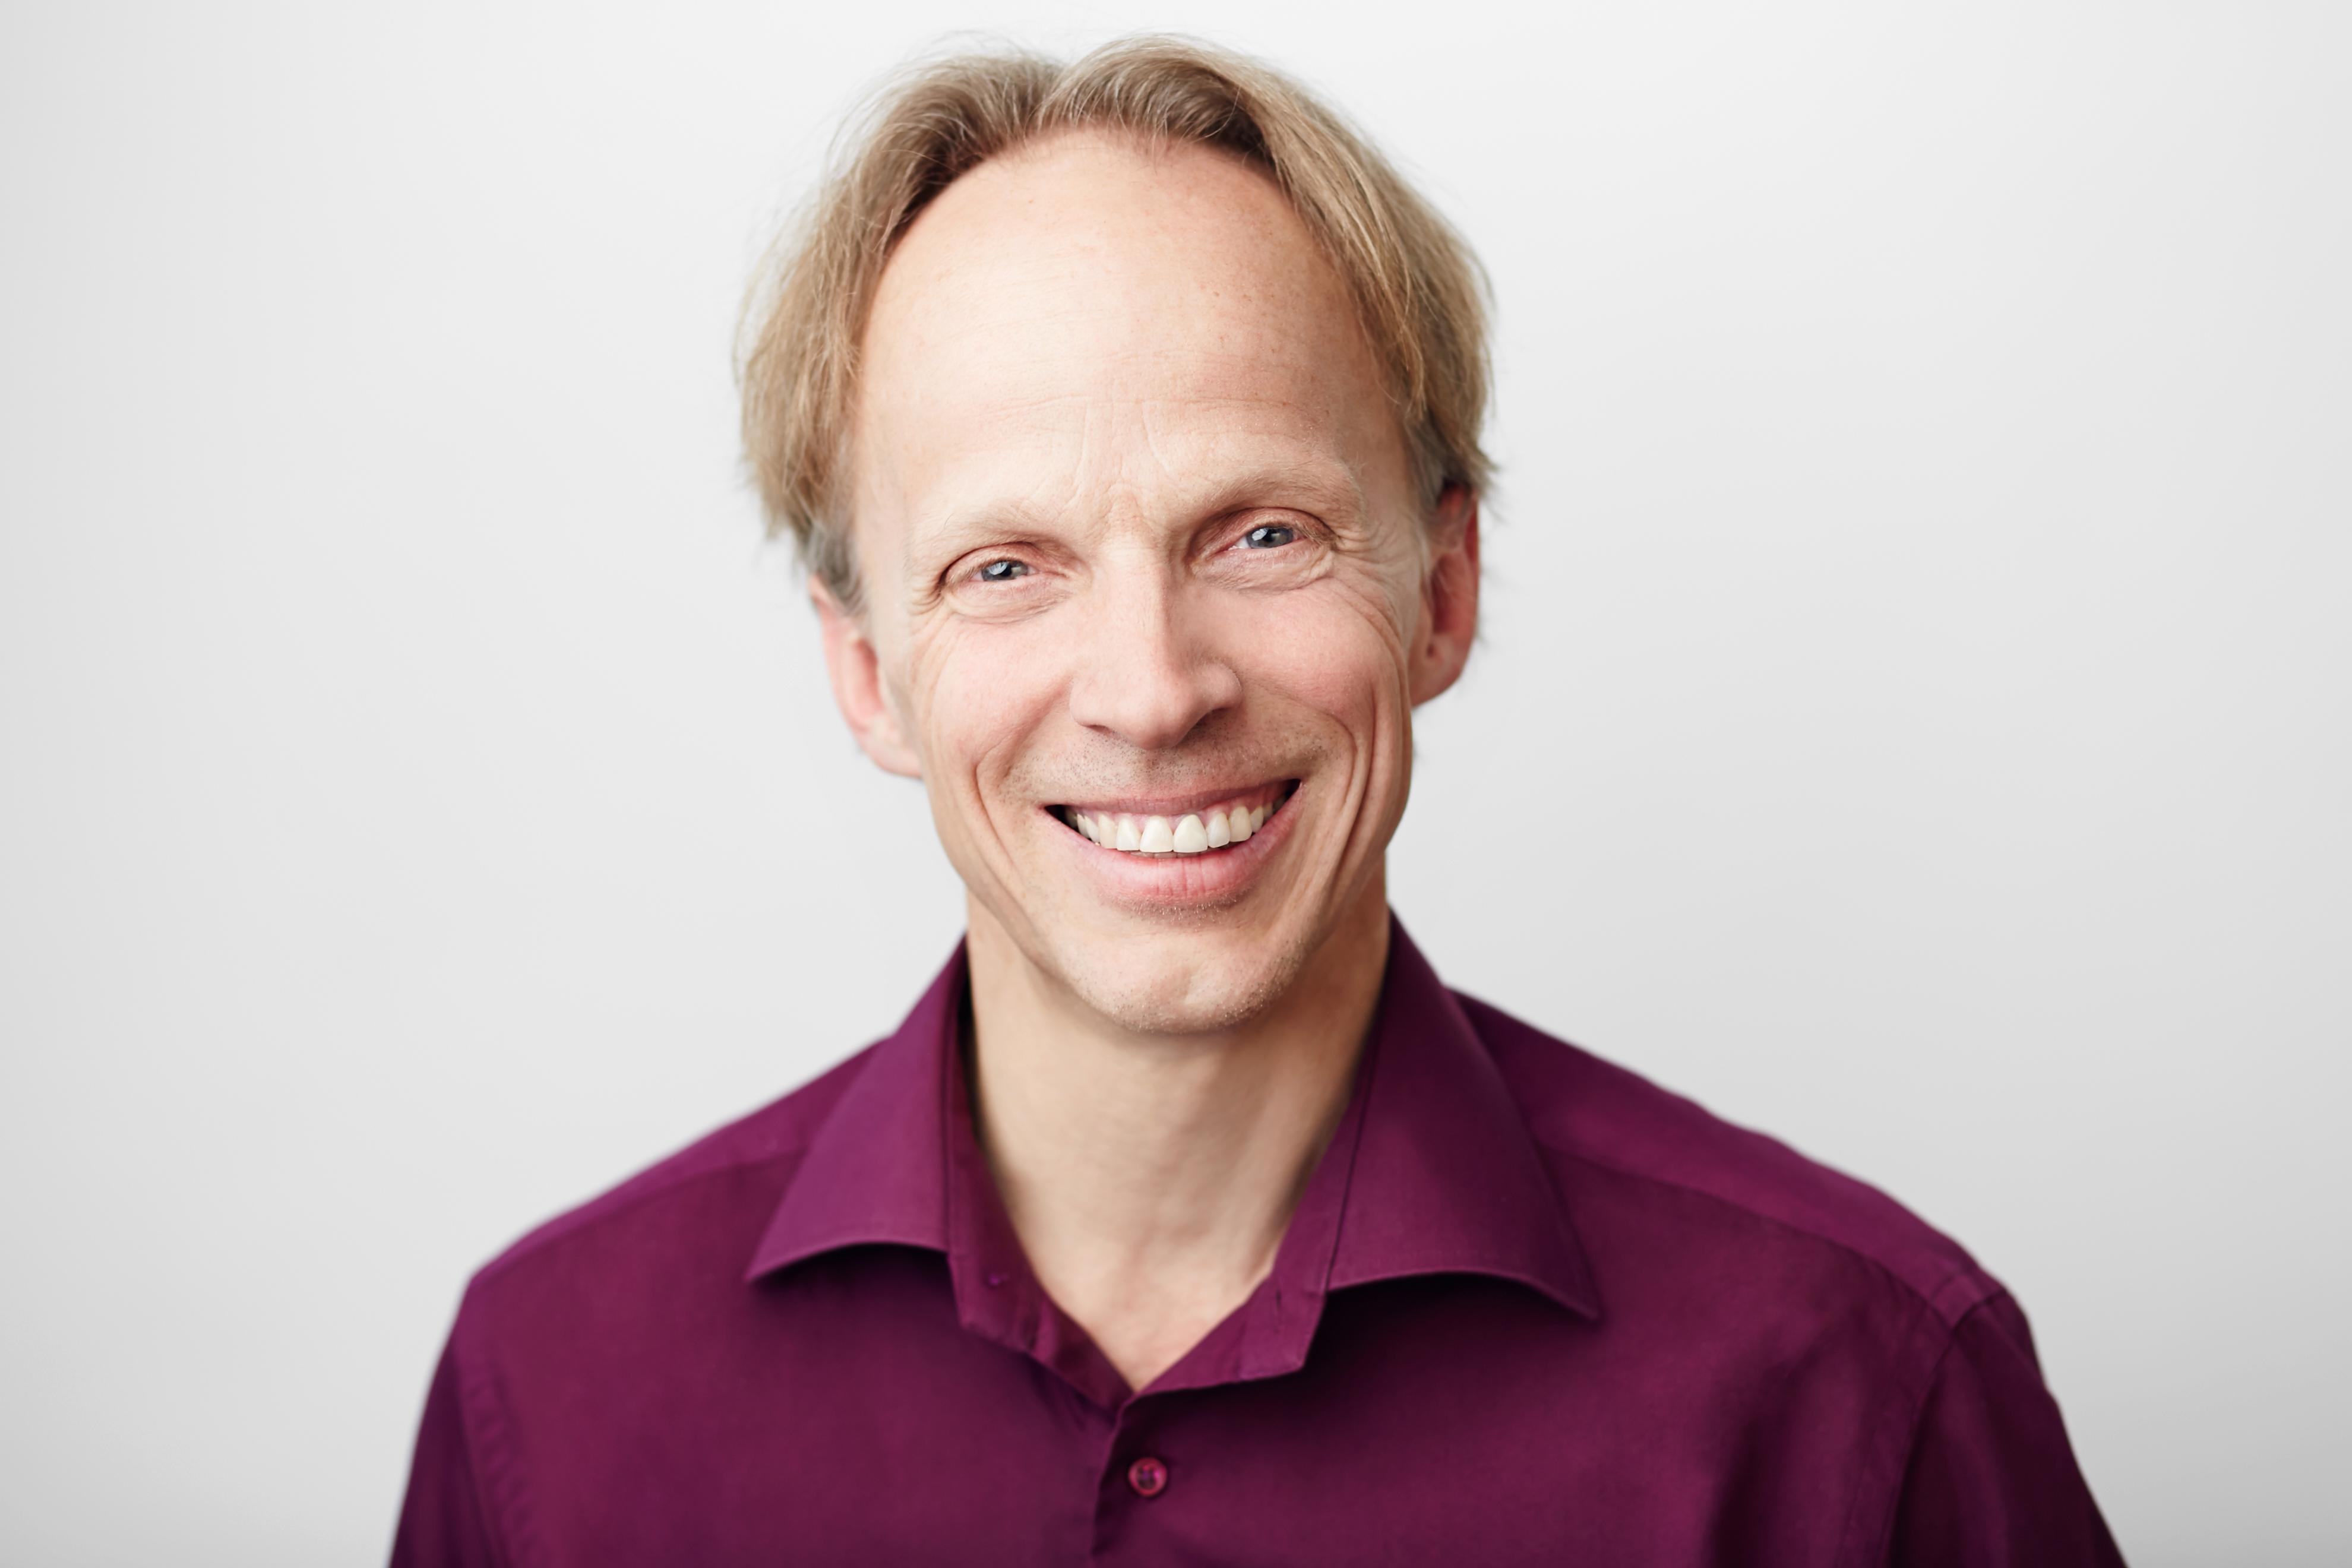 Reinhard Horstkotte